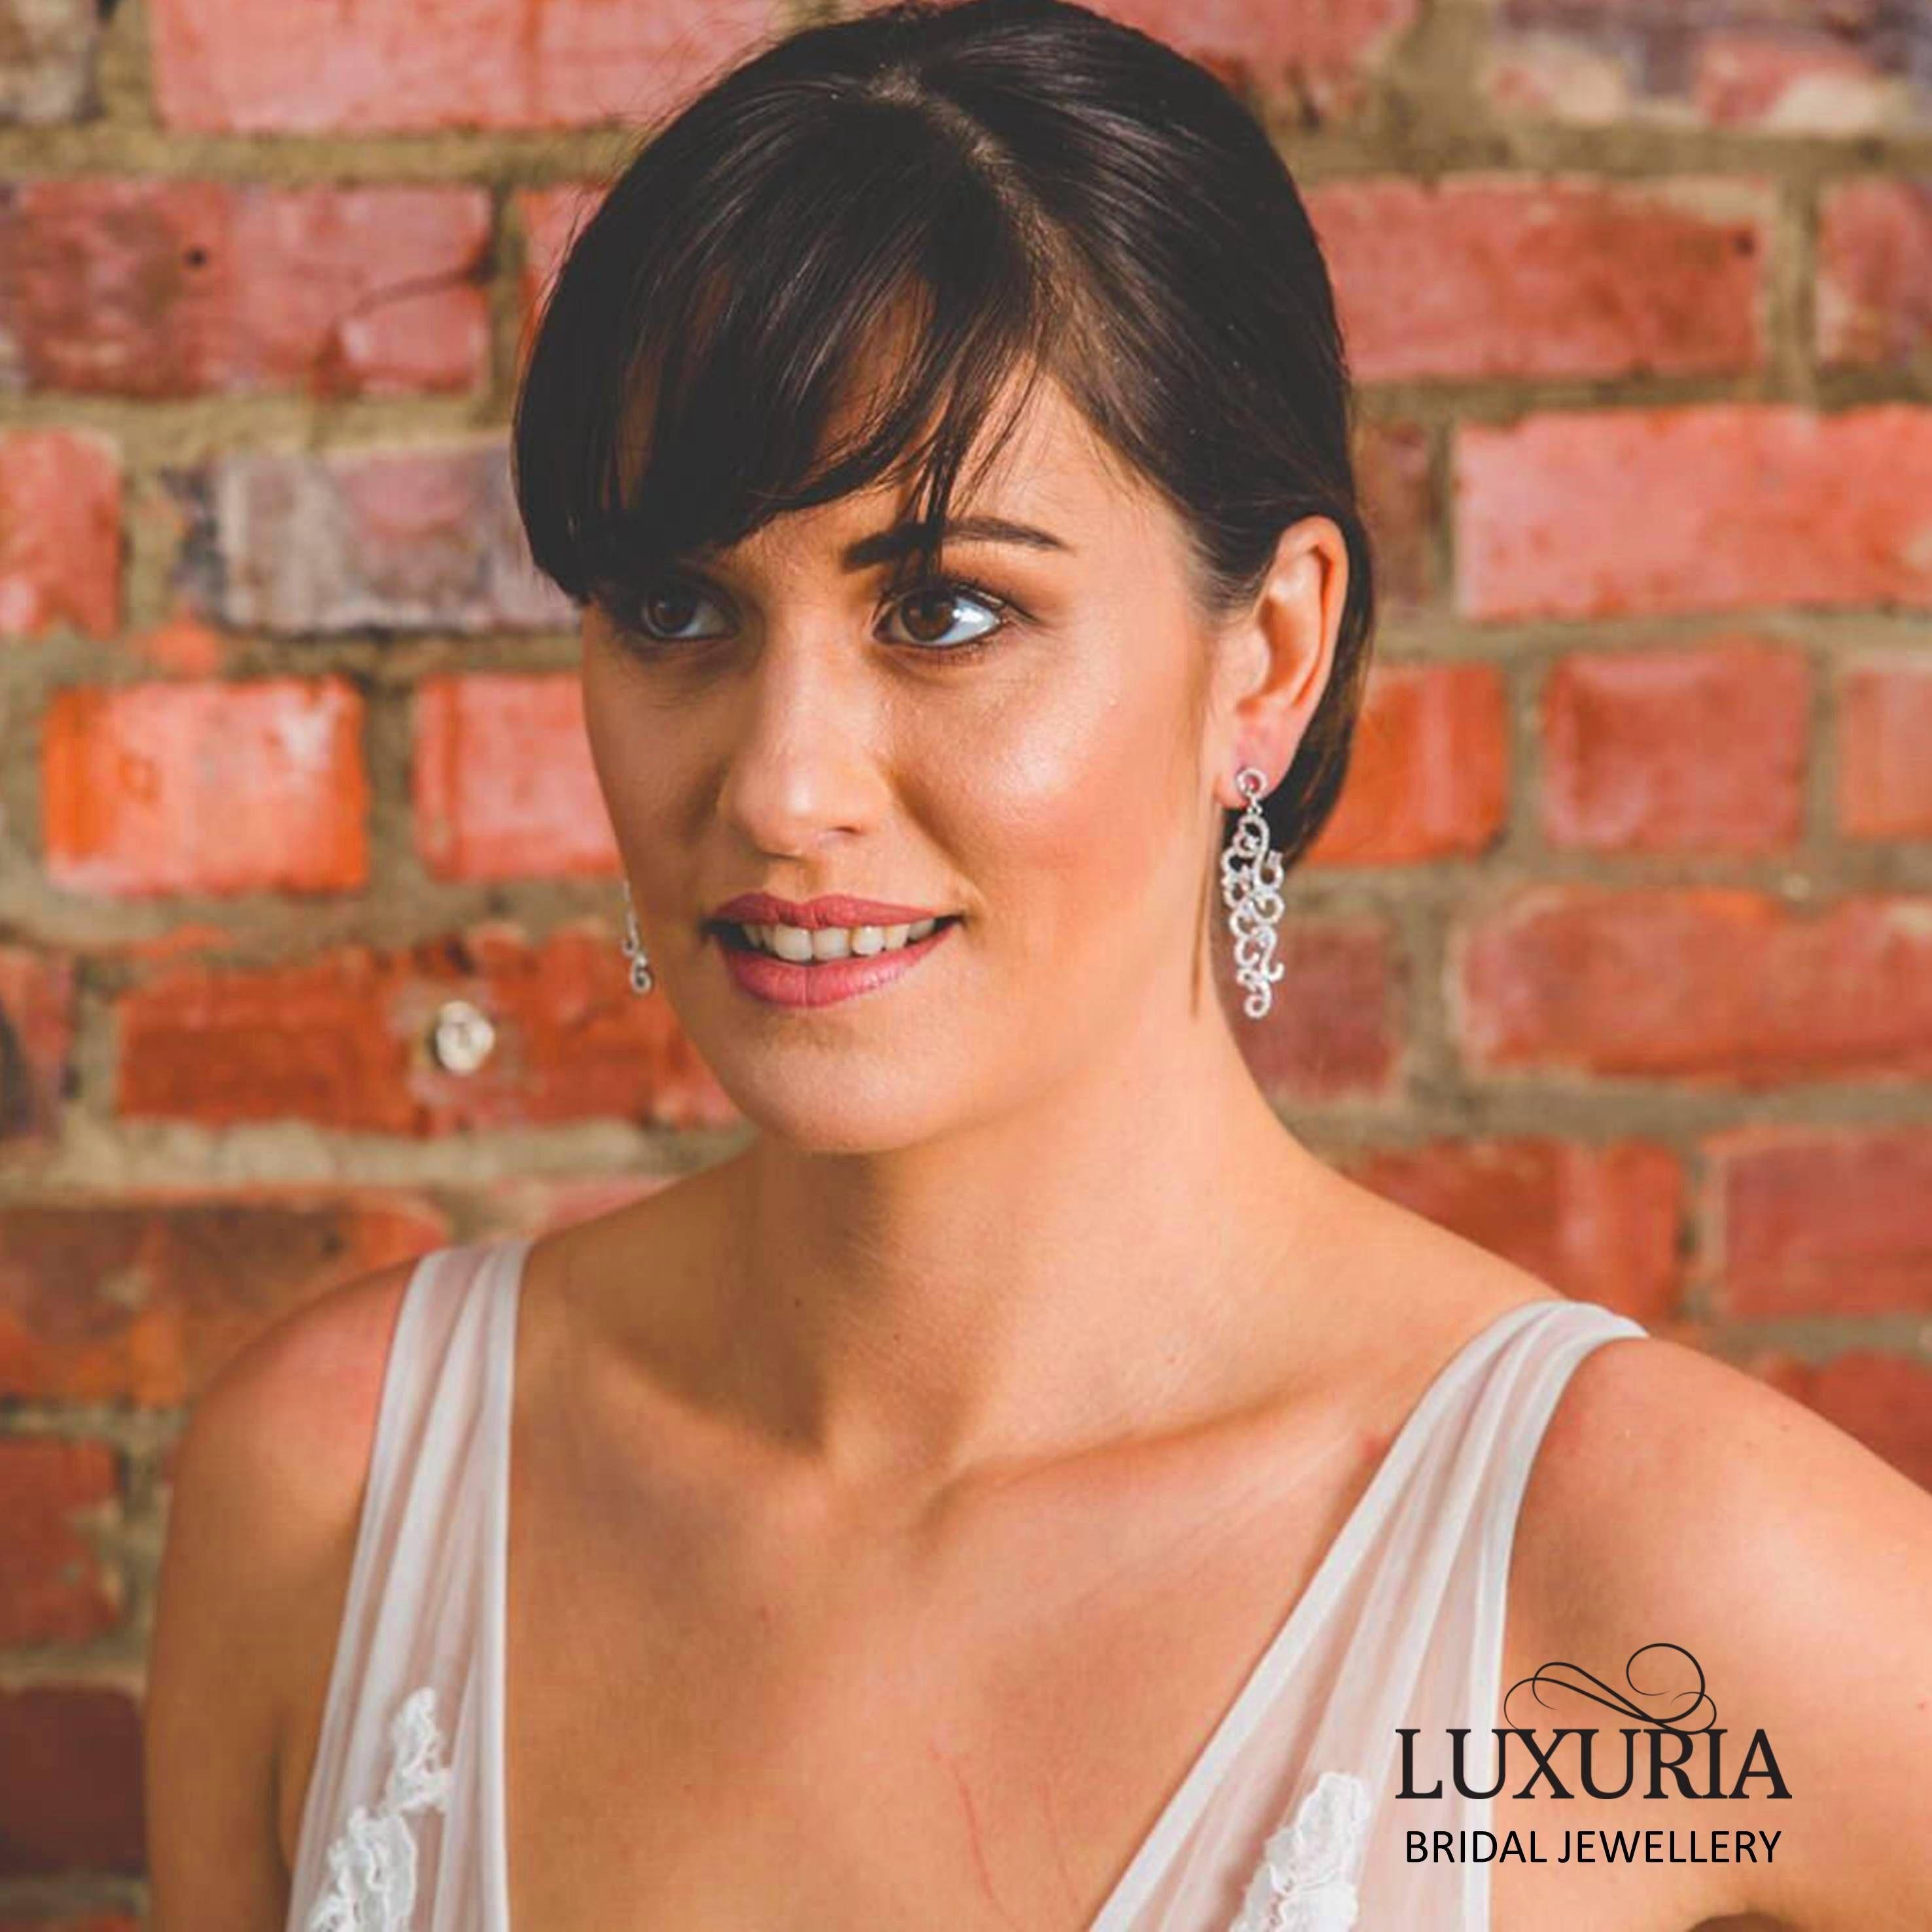 Bride / bridal earrings, long drop with ornate detailing.  Wholesale sterling silver NZ.  Luxuria.  Make up tips brown eyes, pale skin